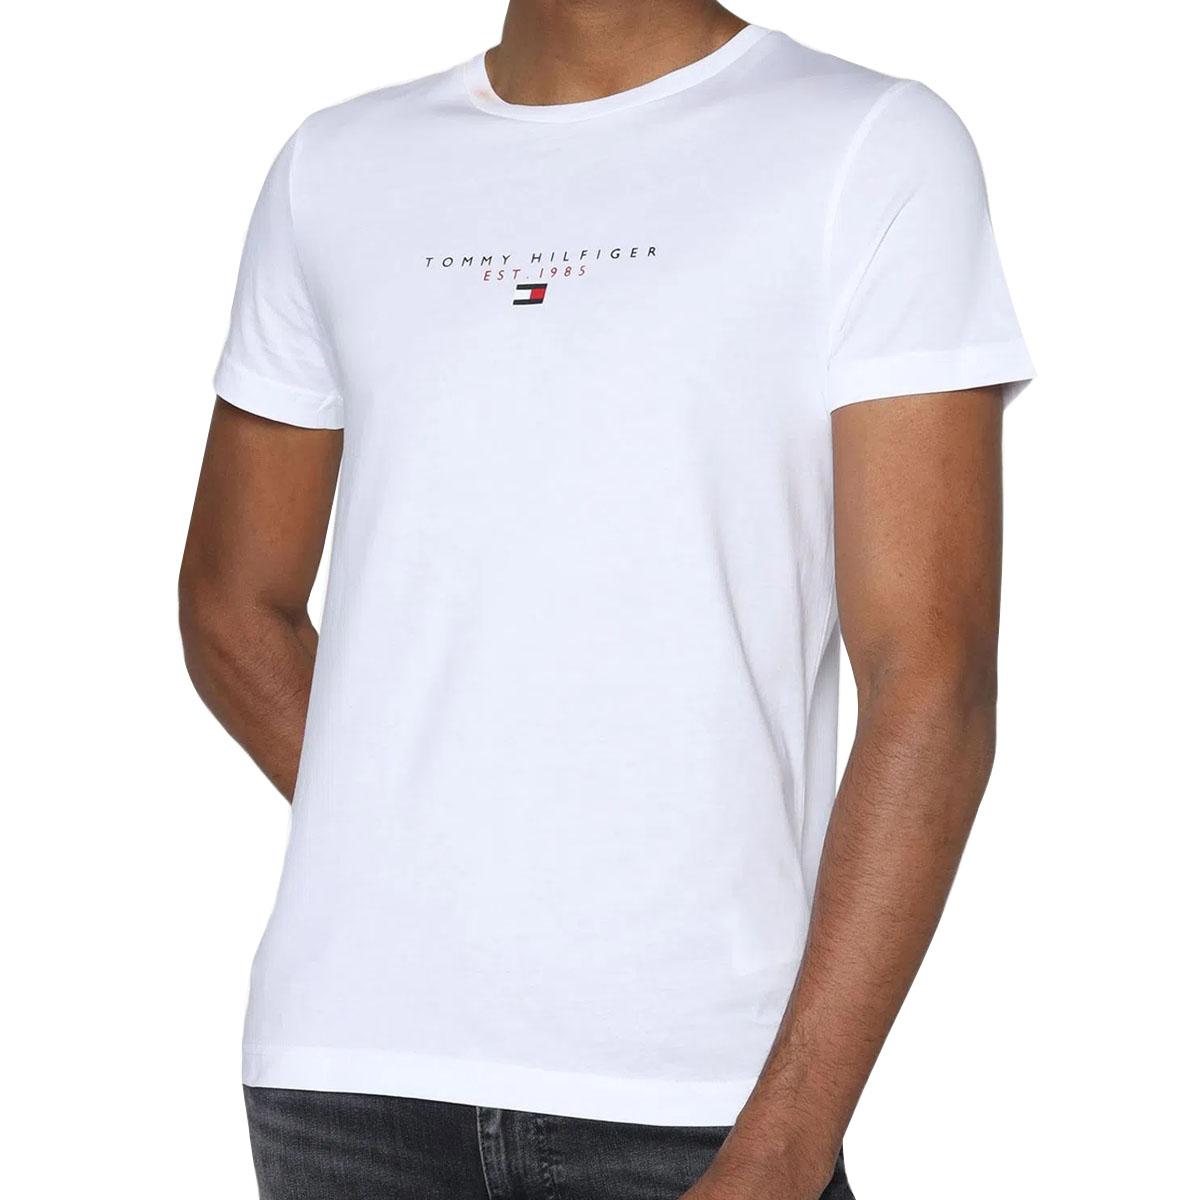 Camiseta Tommy Hilfiger Essential Tee Branca